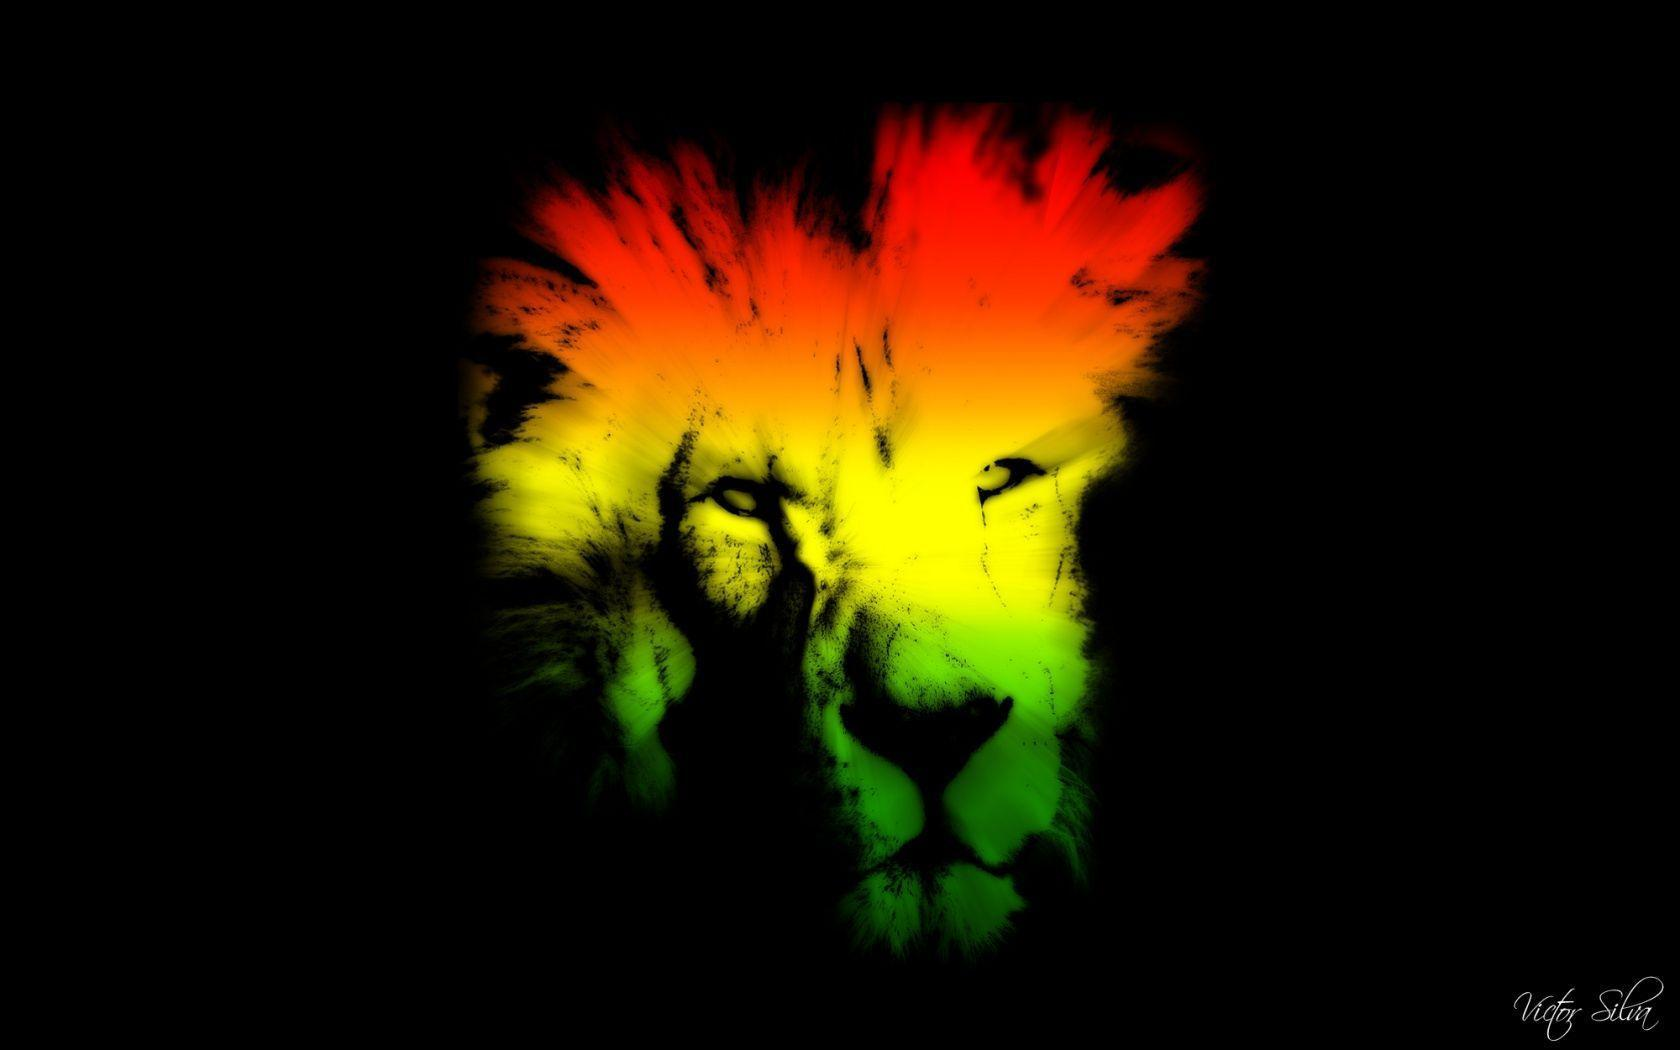 Rasta Lion Wallpapers - Wallpaper Cave Rasta Lion Wallpapers